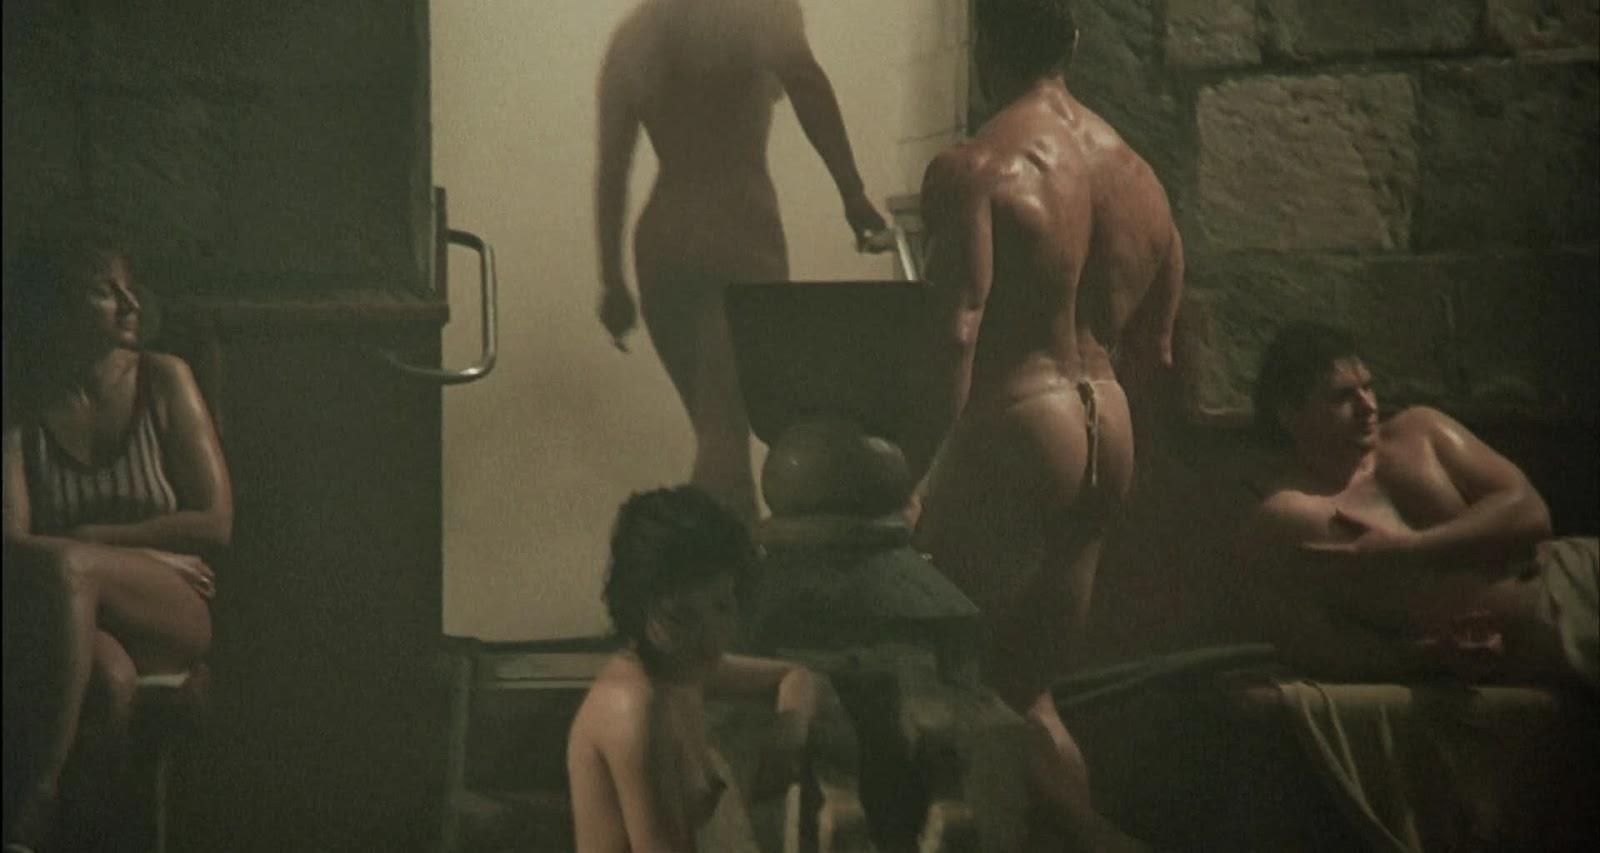 Arnold nude picture schwarzenegger